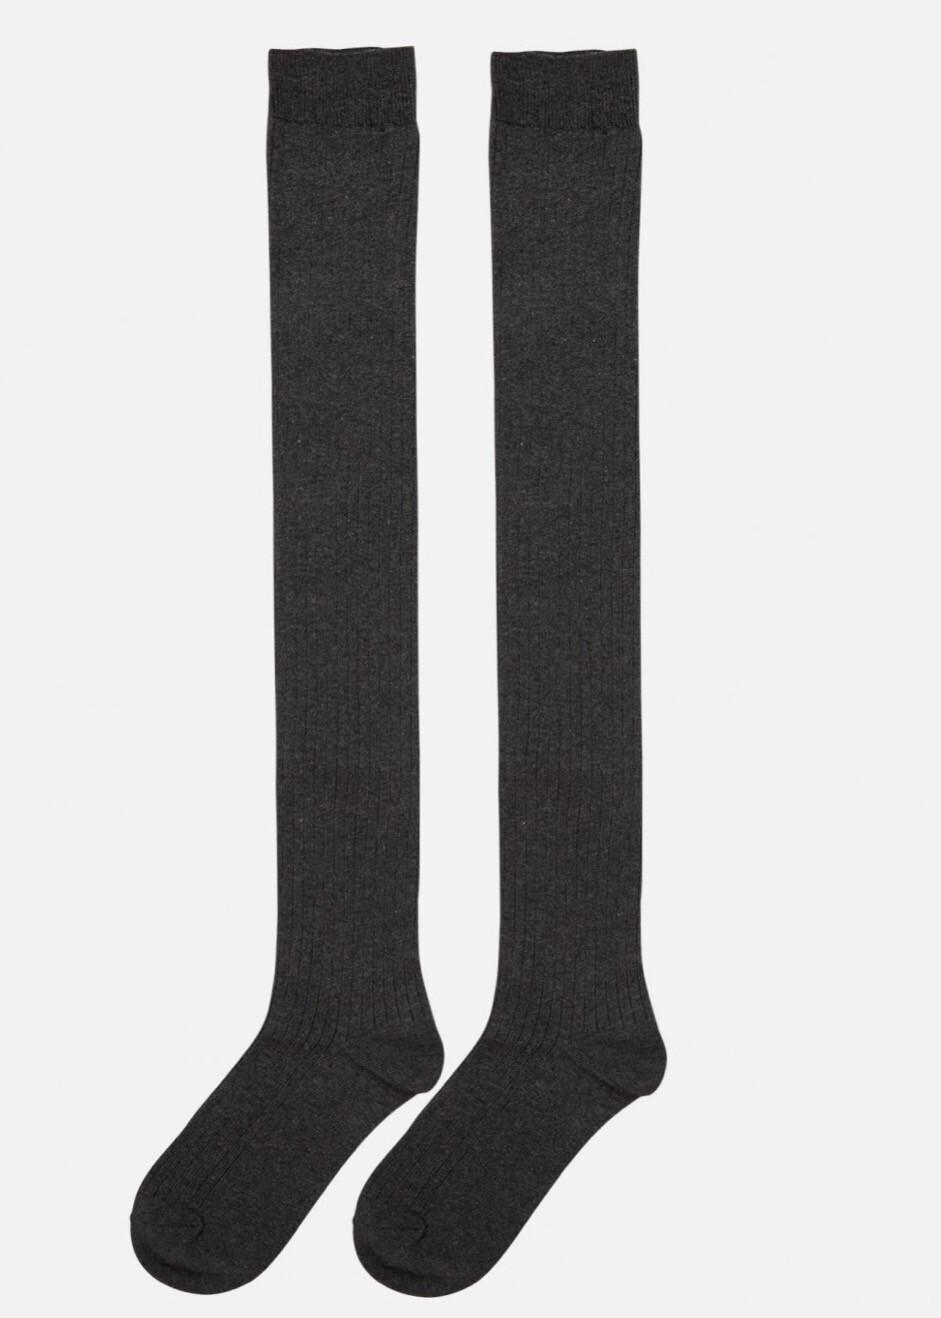 Knee socks Moss grey